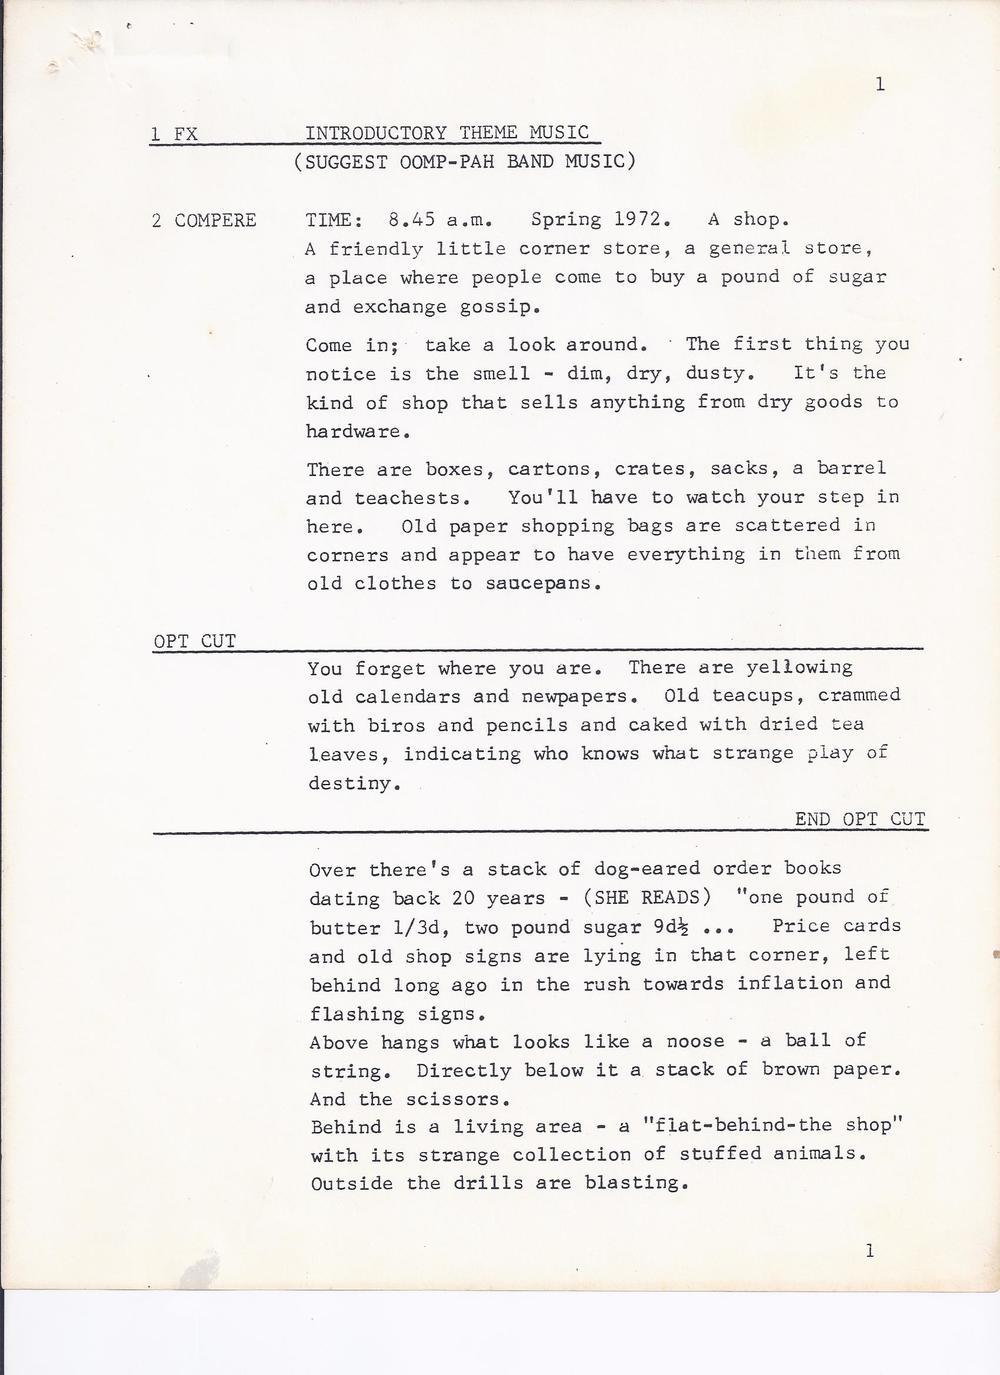 Joe and Rose Radio Play script sample0002.jpg